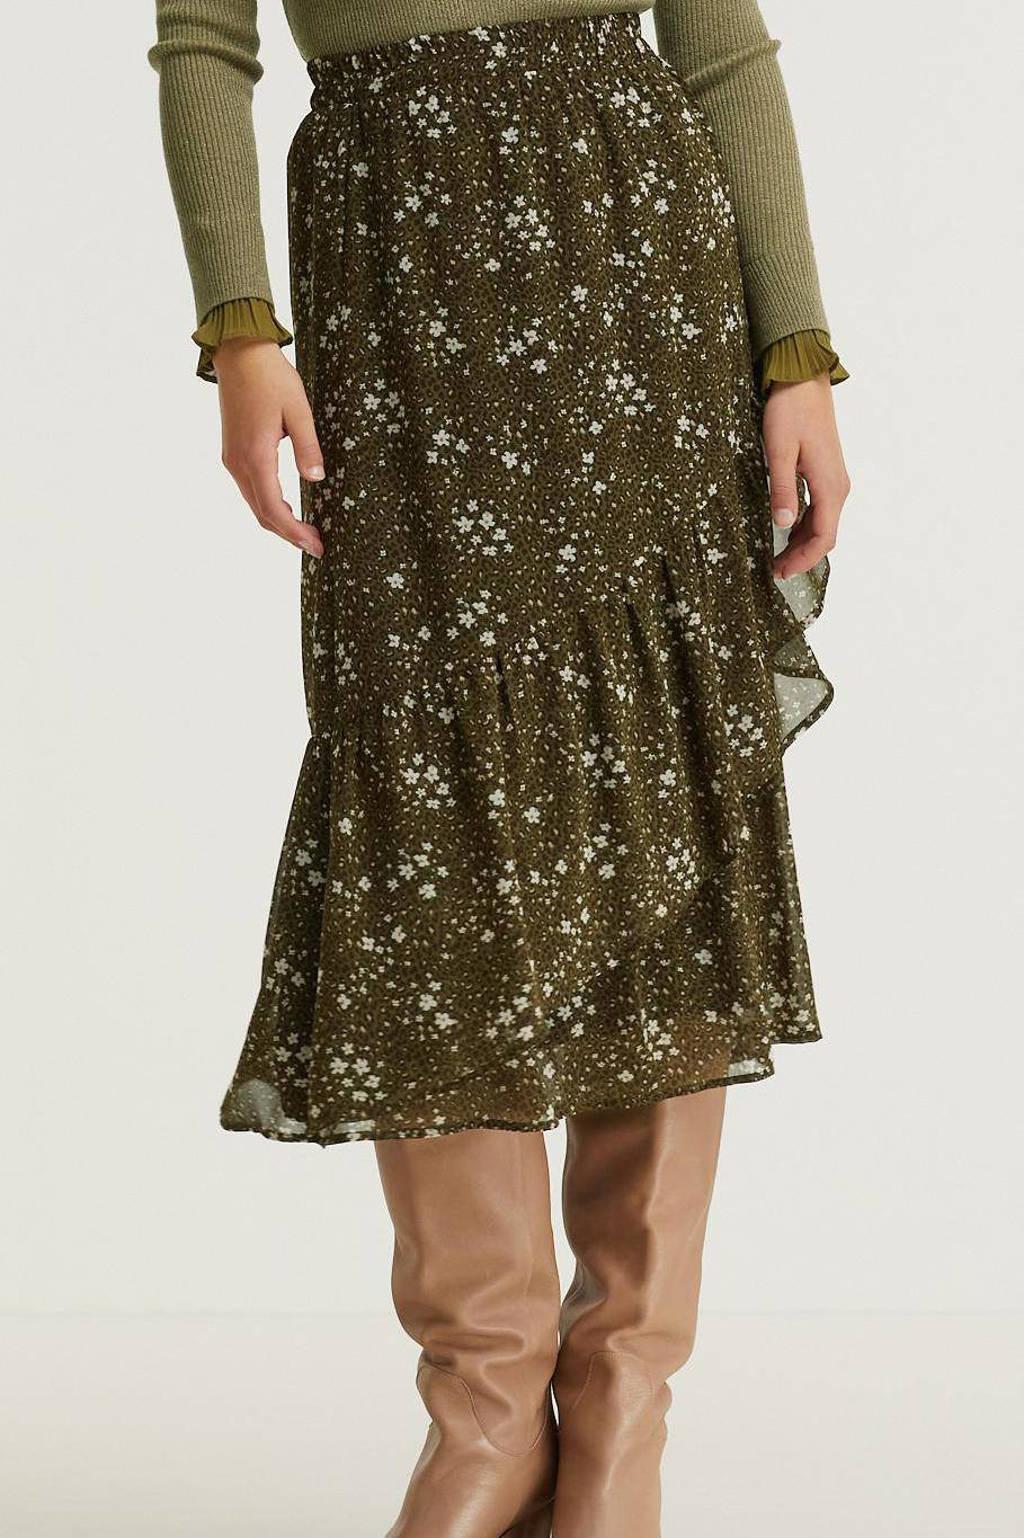 Esqualo gebloemde semi-transparante rok donkergroen/zwart/wit, Print